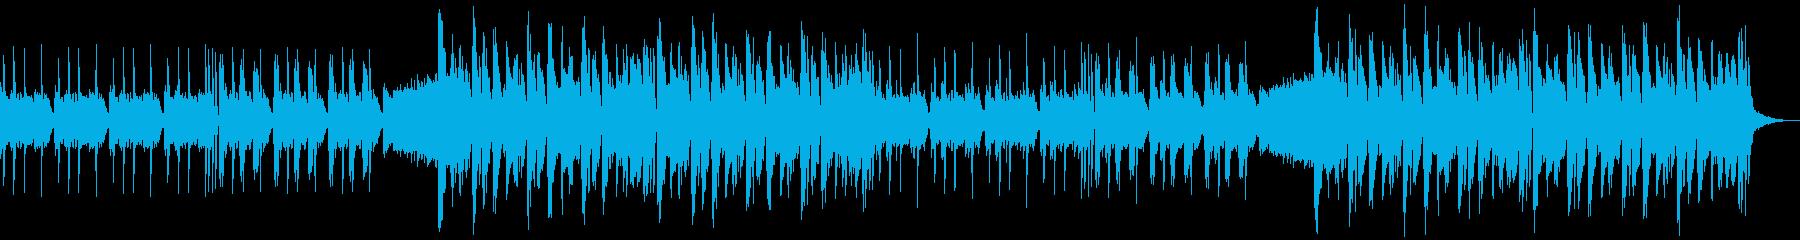 CM・ギター・クラップ・エキサイティングの再生済みの波形